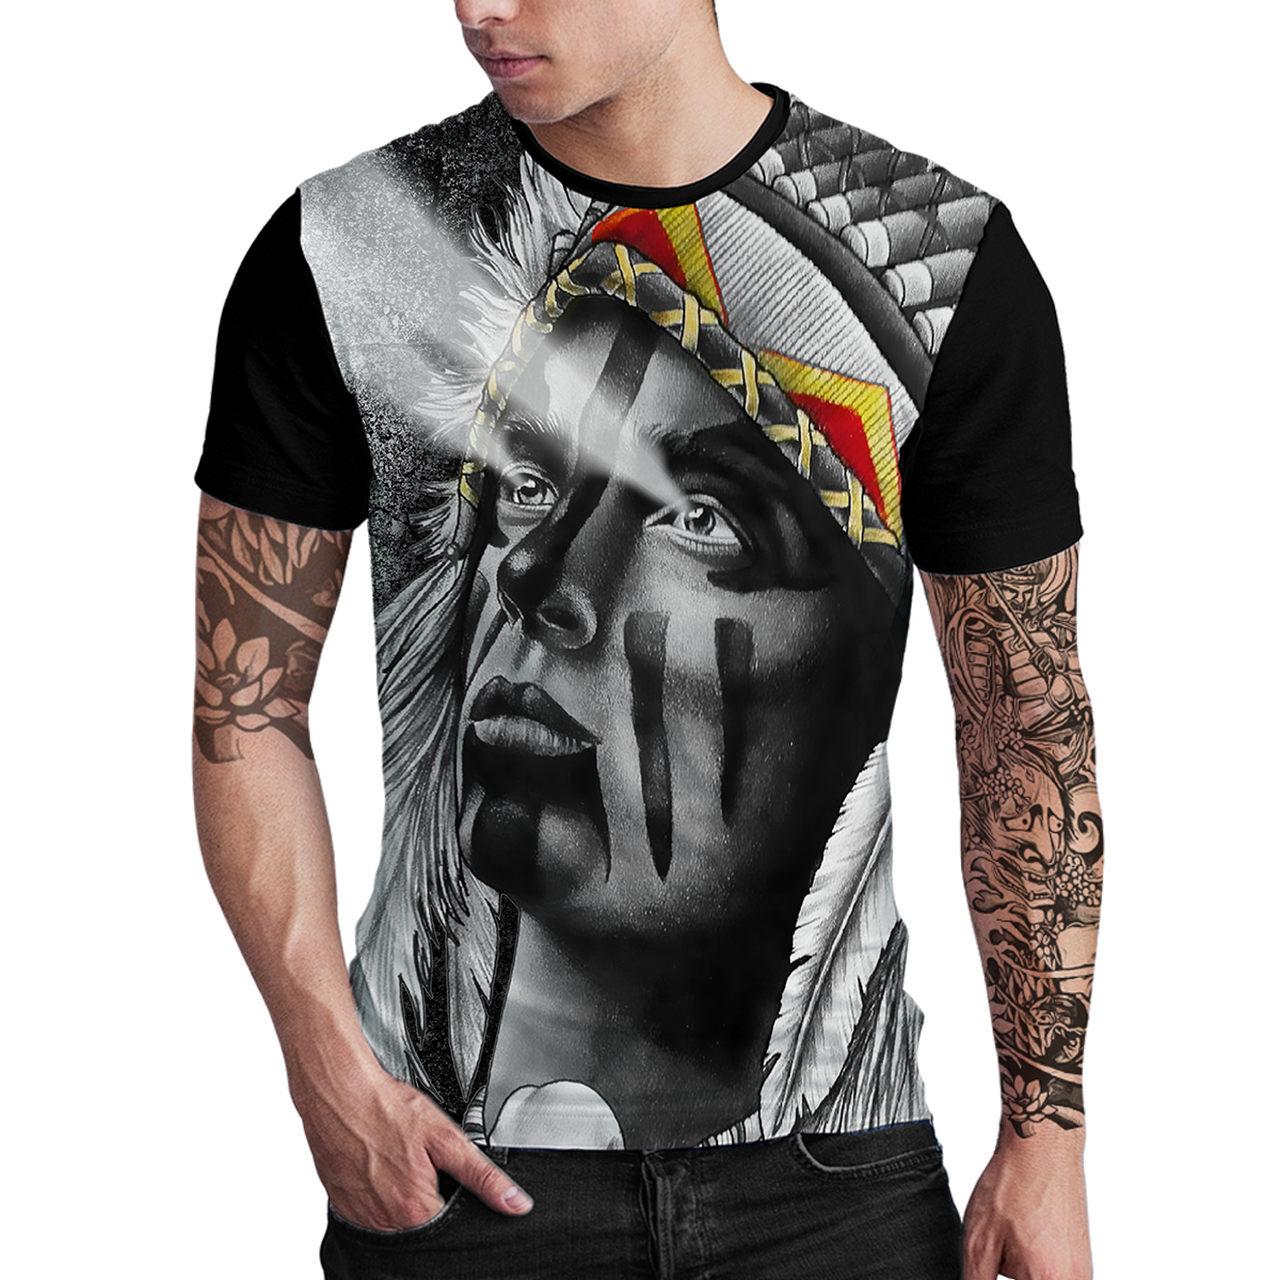 Stompy Camiseta Estampada Masculina Modelo 127